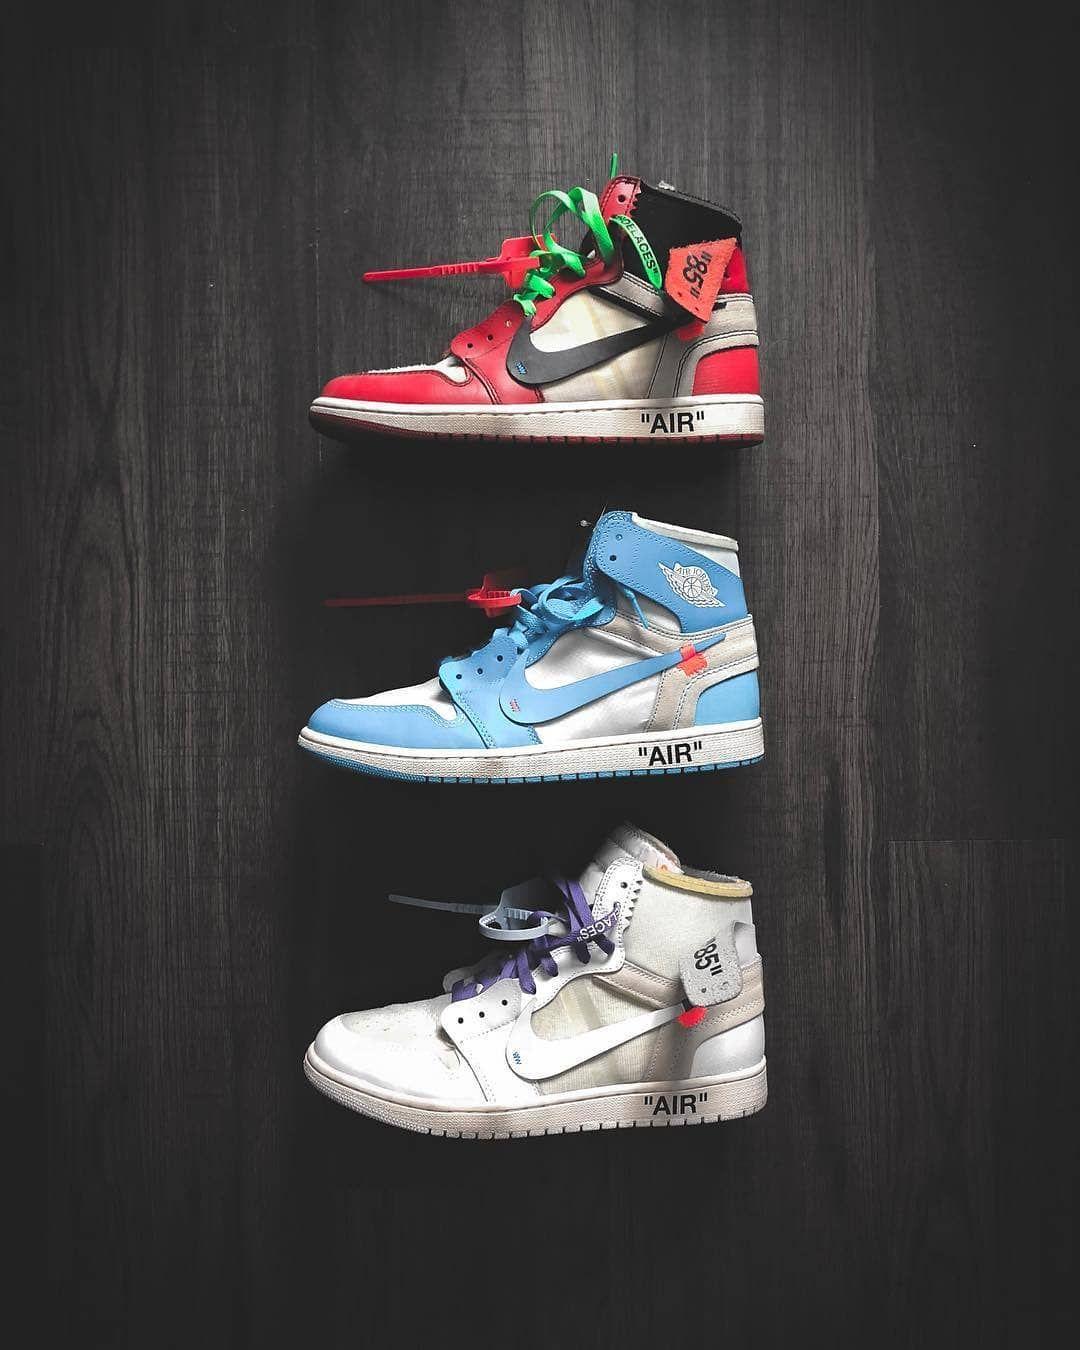 sneakers of the week. #sneakeroftheweek. A retrouver sur www